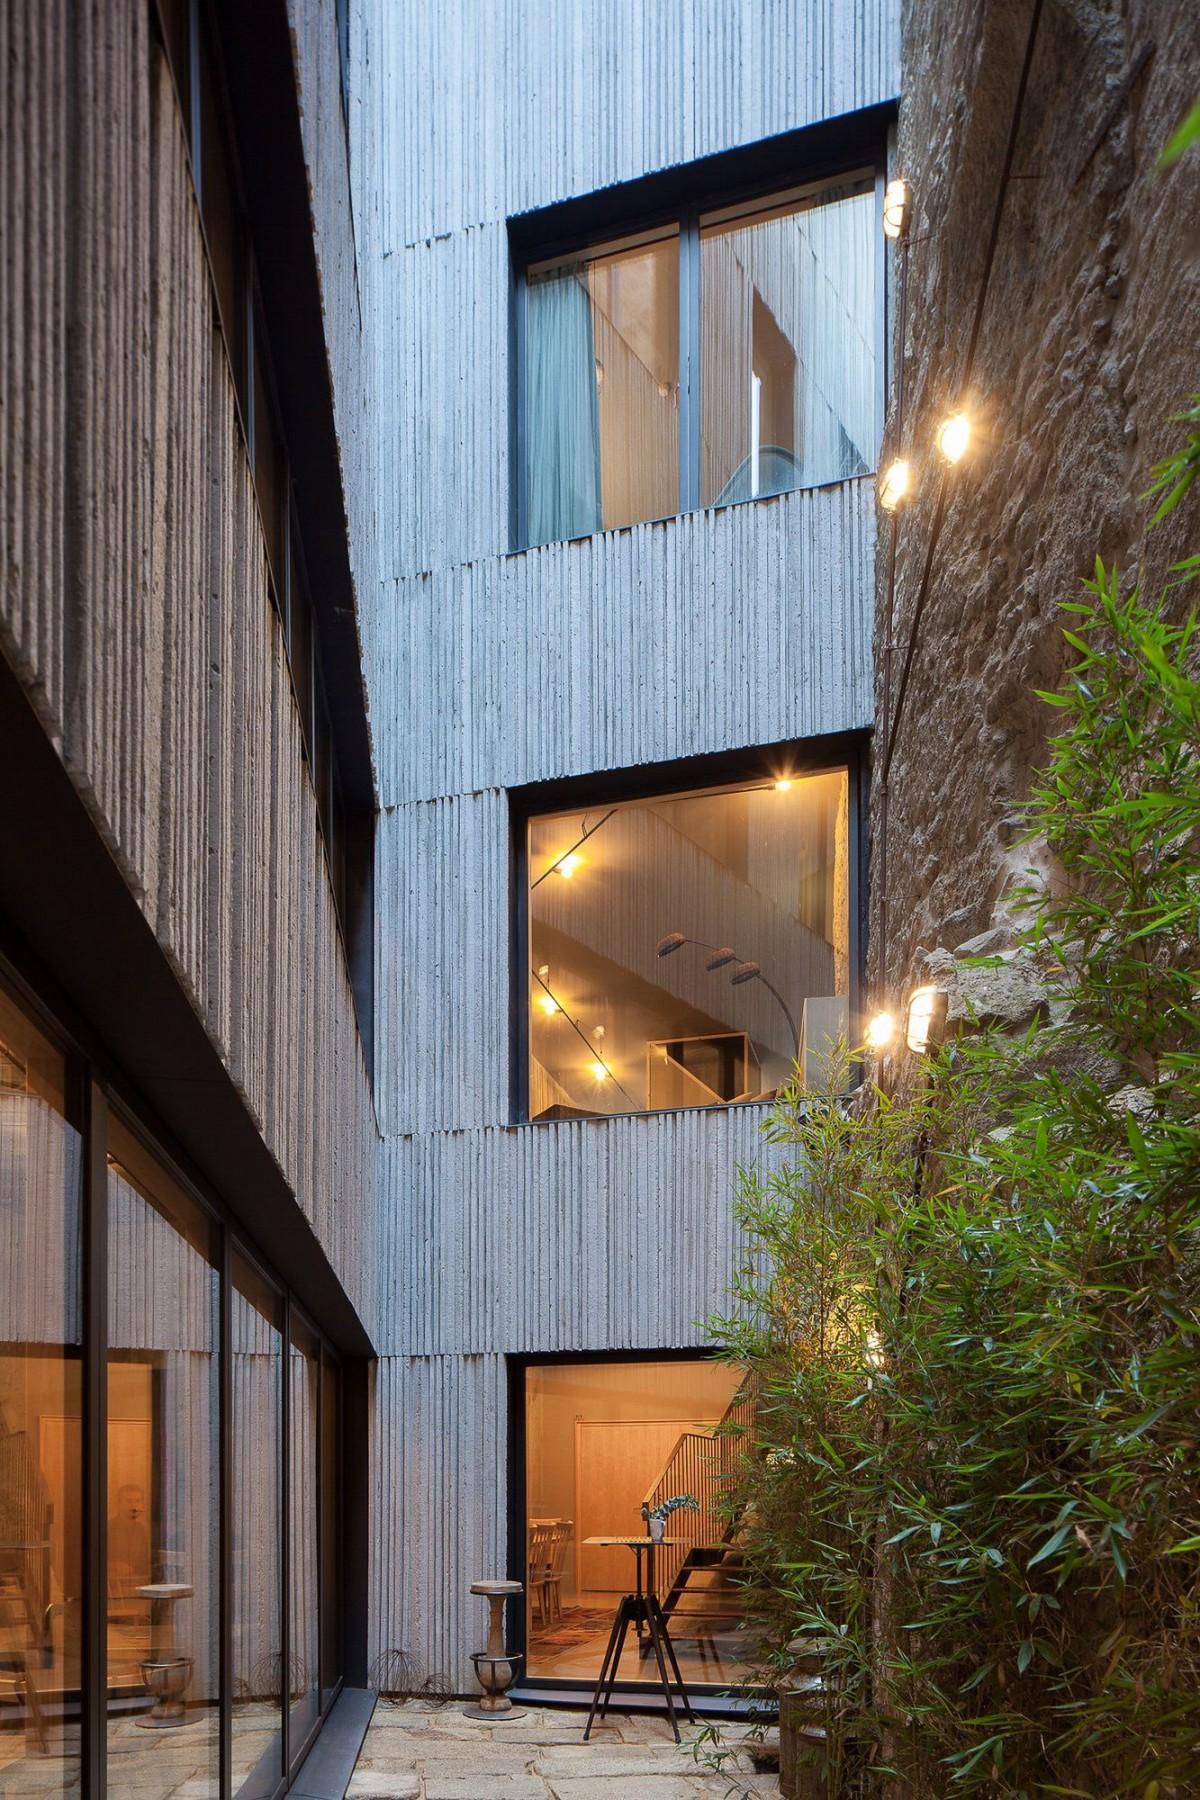 stepienybarno-stepien-y-barno-arquitectura-ProyectoDelDia-pedra-liquida-afasia-archzine-jose-campos